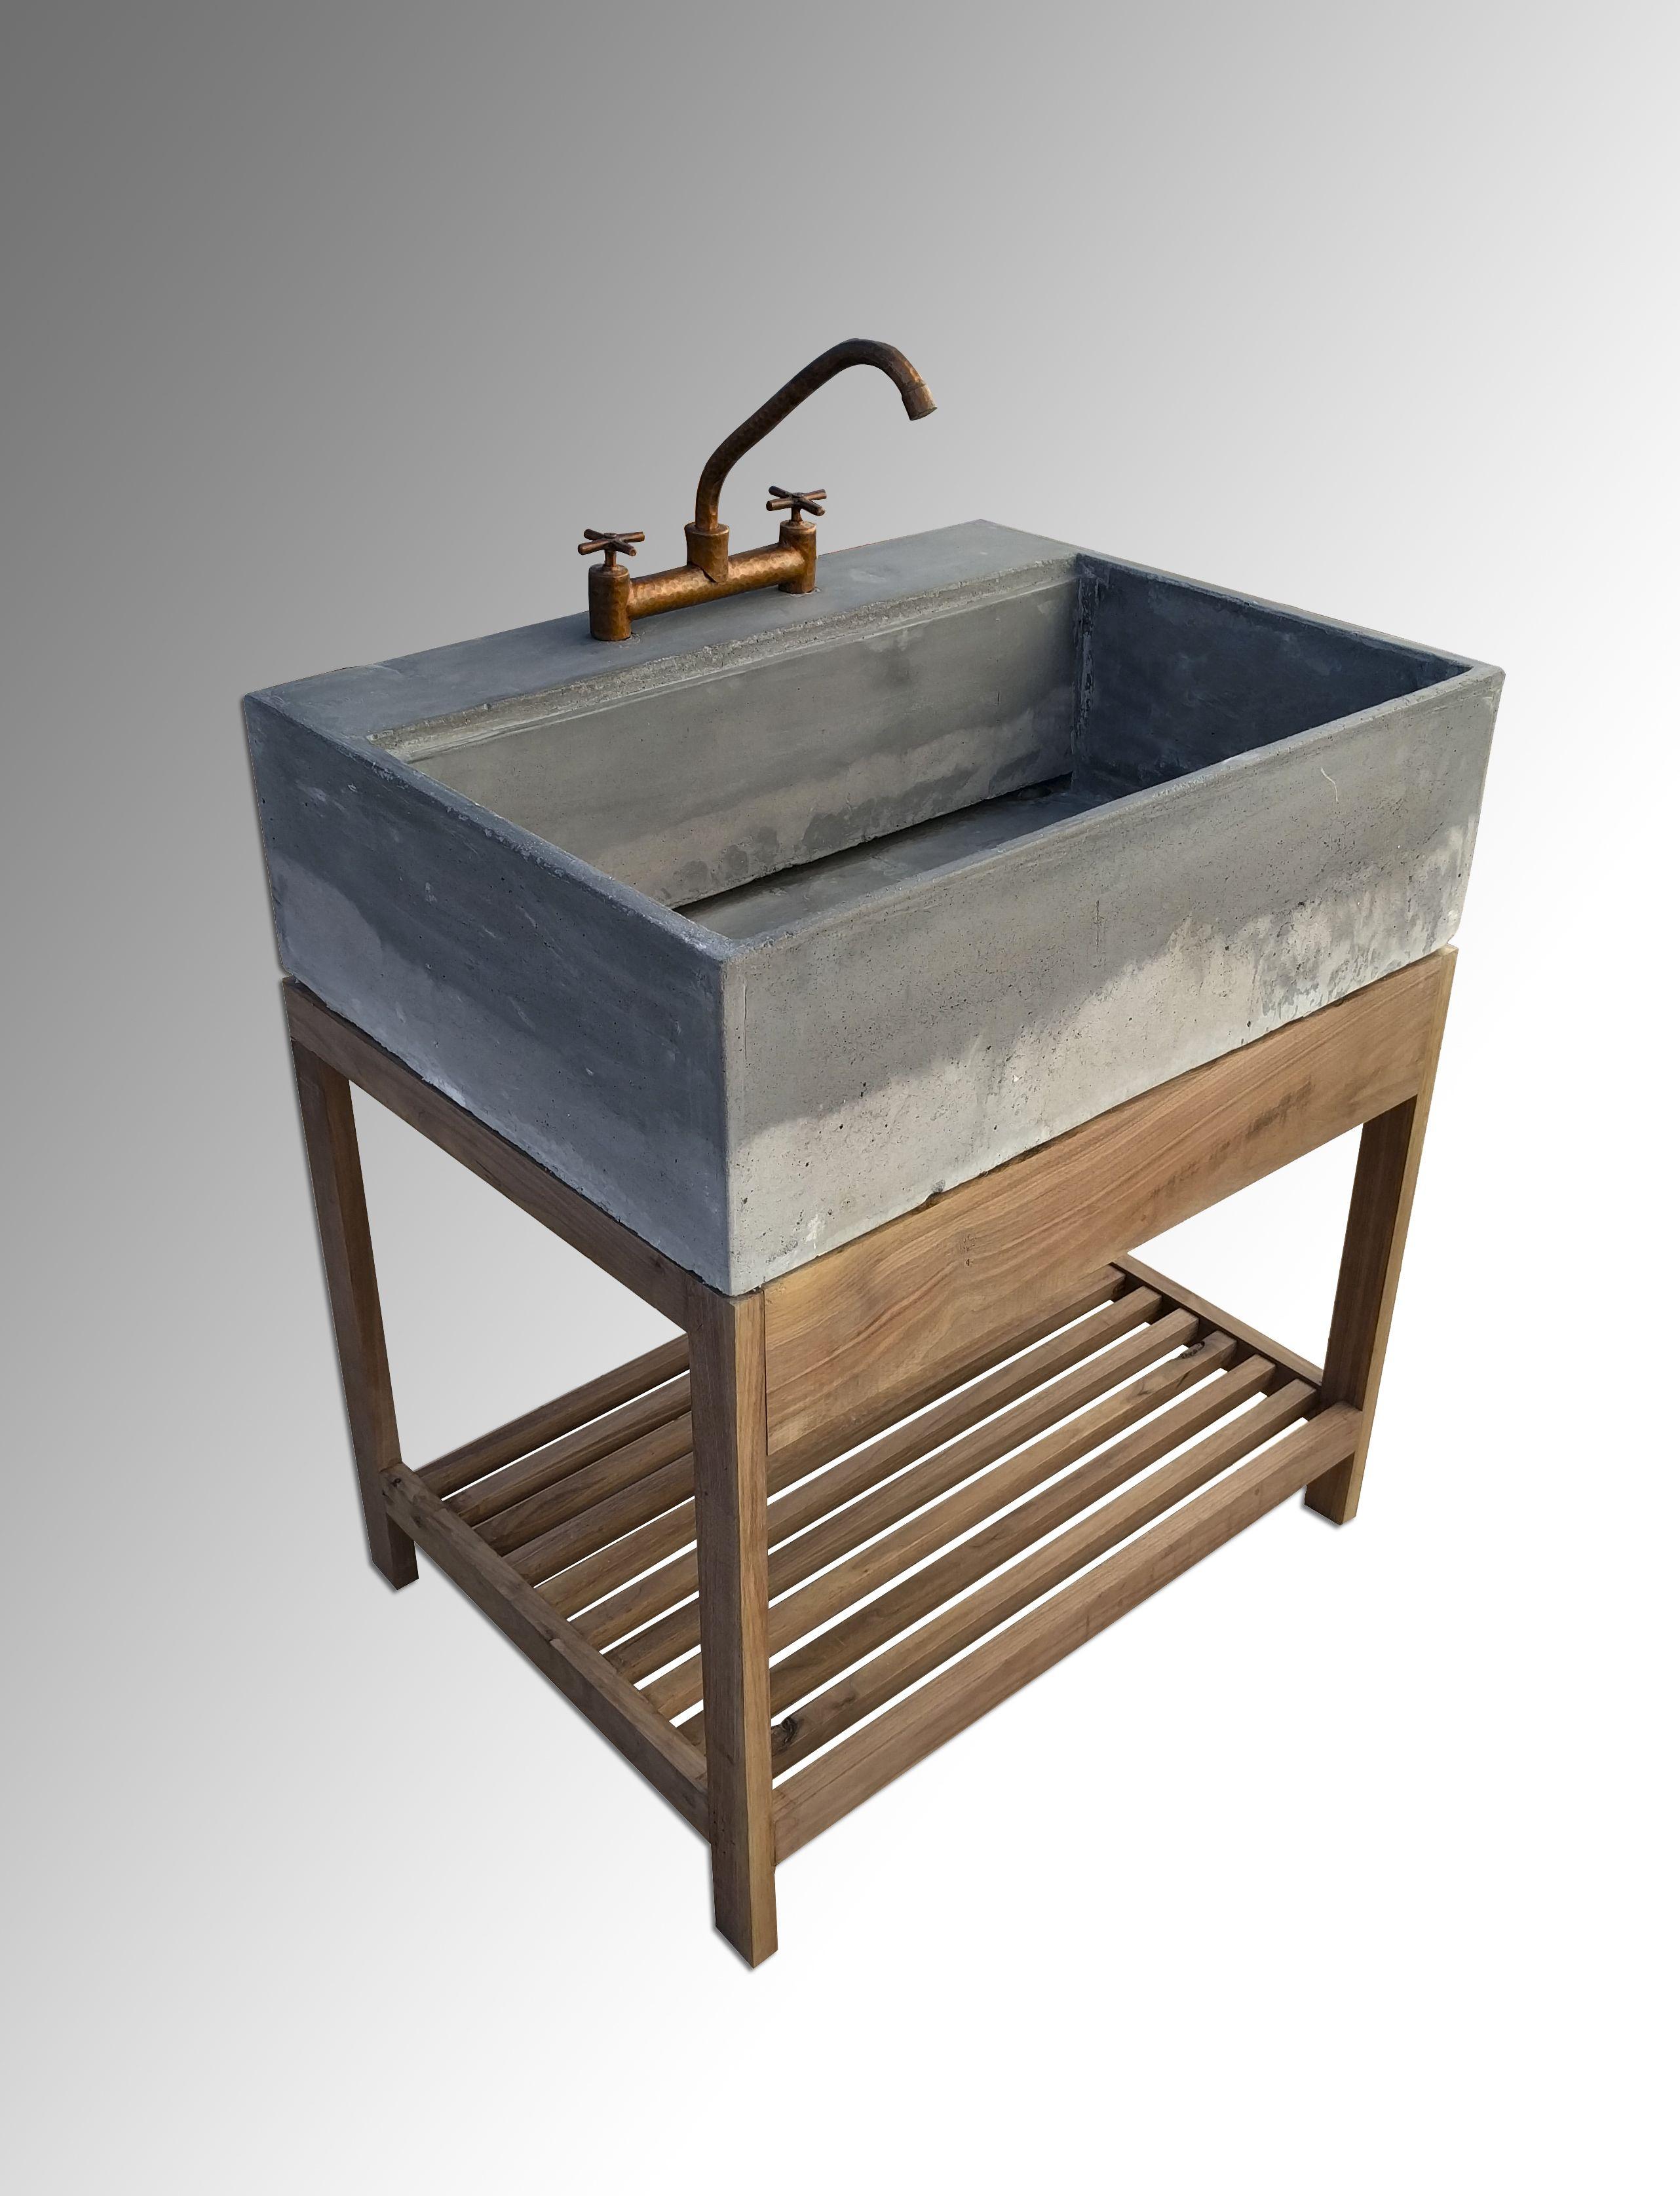 Tarja de concreto para cocina estilo rustico grifo de for Grifos de cobre